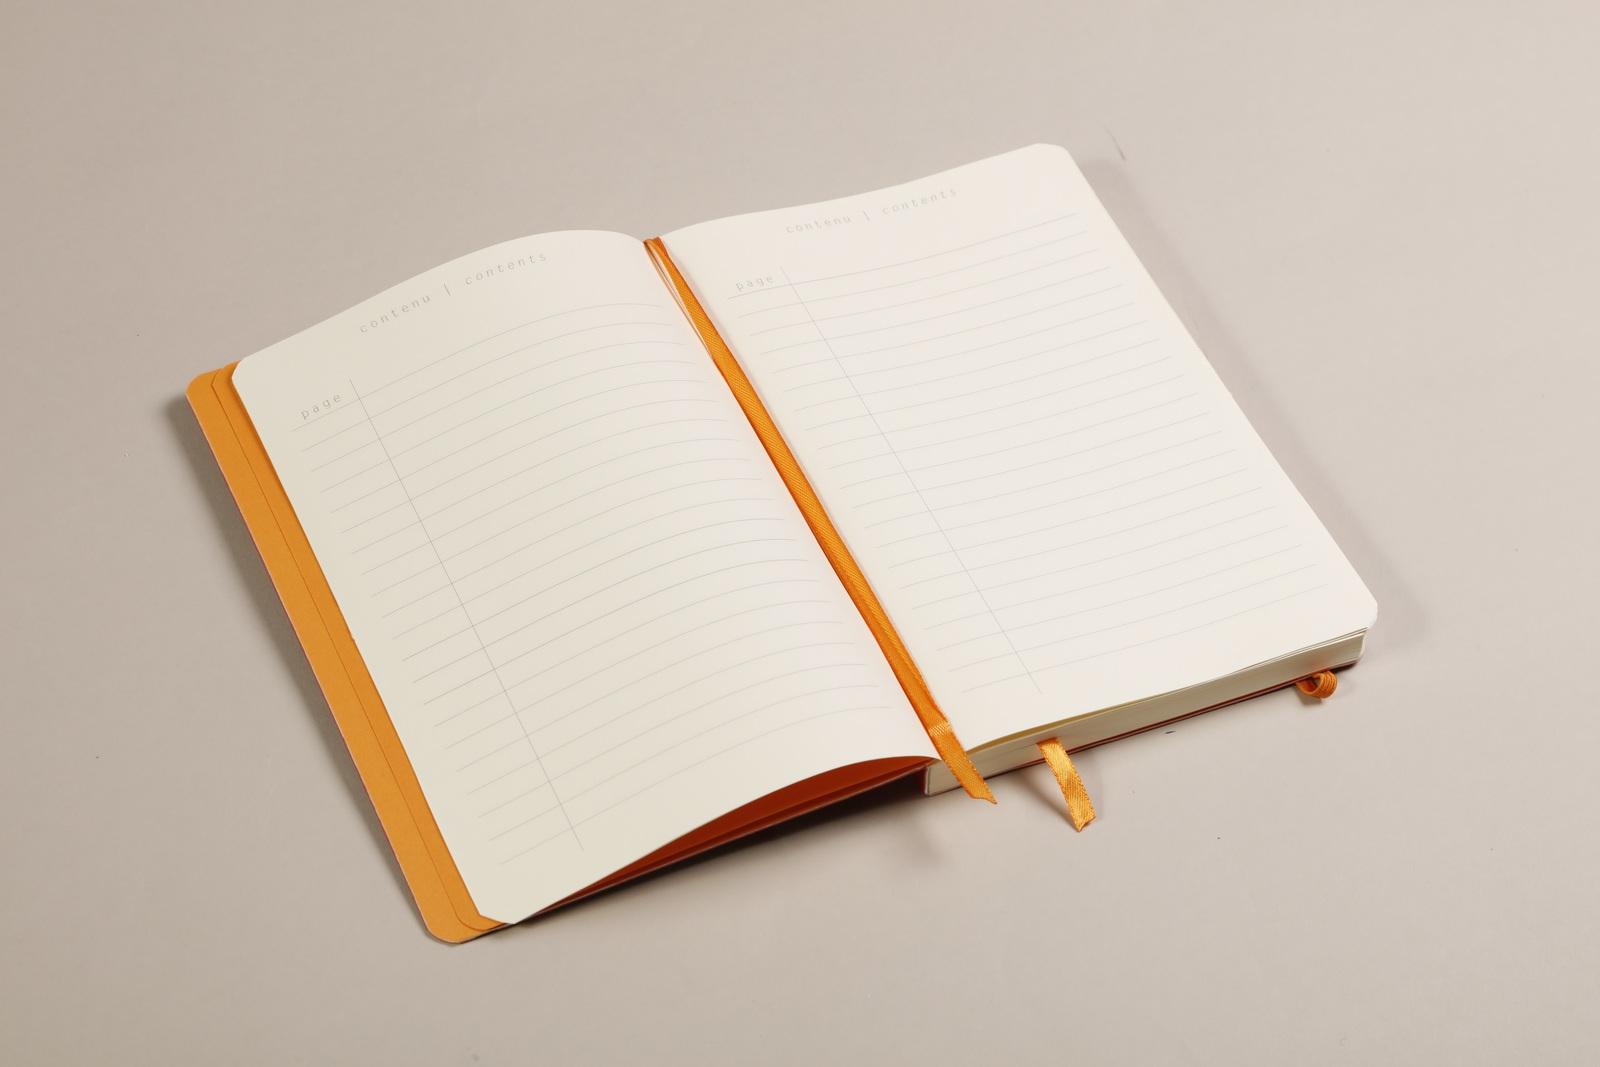 Rhodiarama A5 Goalbook Dot Grid - Poppy image